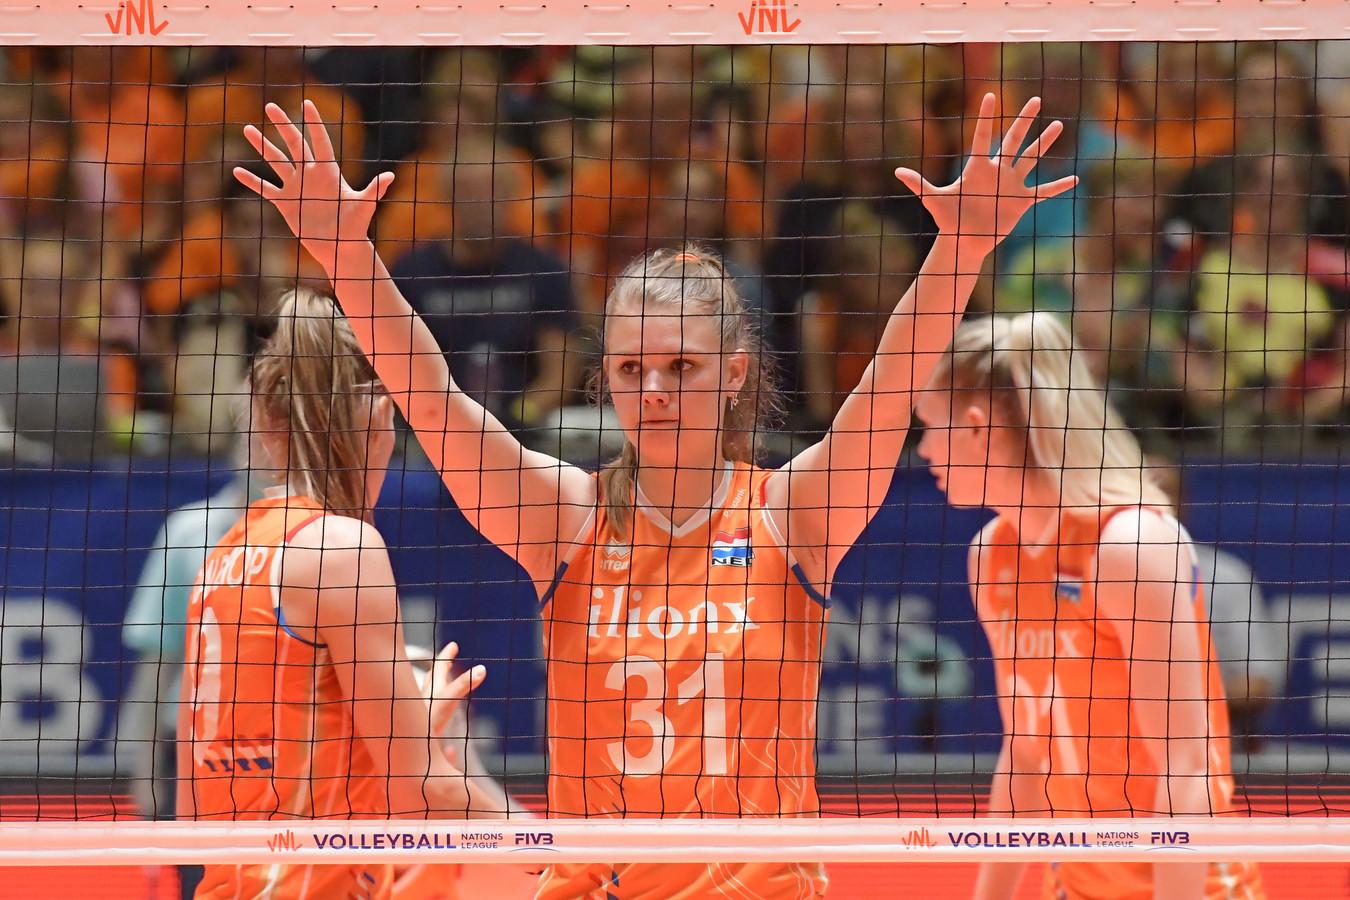 Vlnr: Nika Daalderop, Eline Timmerman en Annick Meijers.